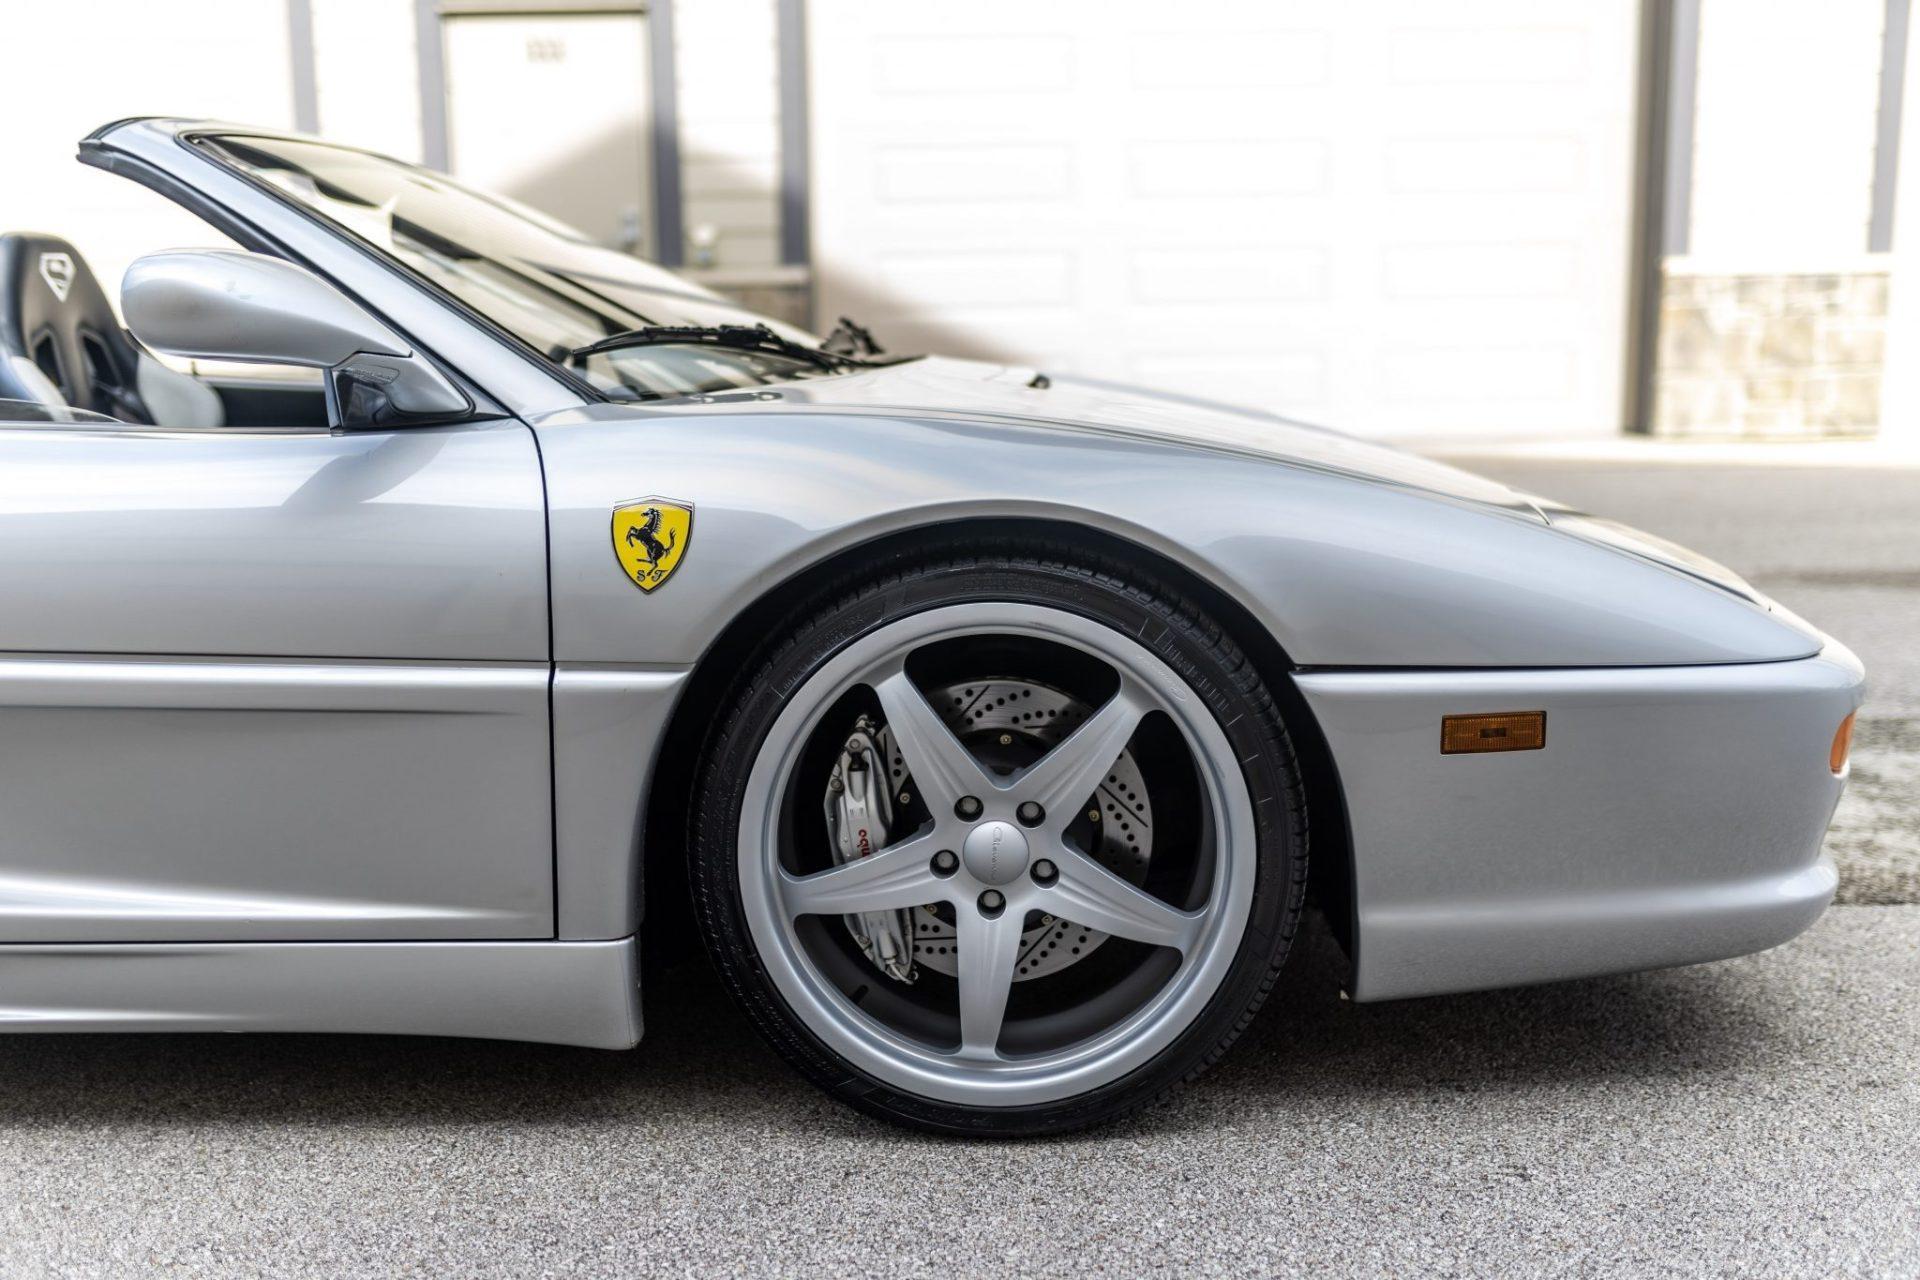 Ferrari F355 Spider Shaquille Oneal 18